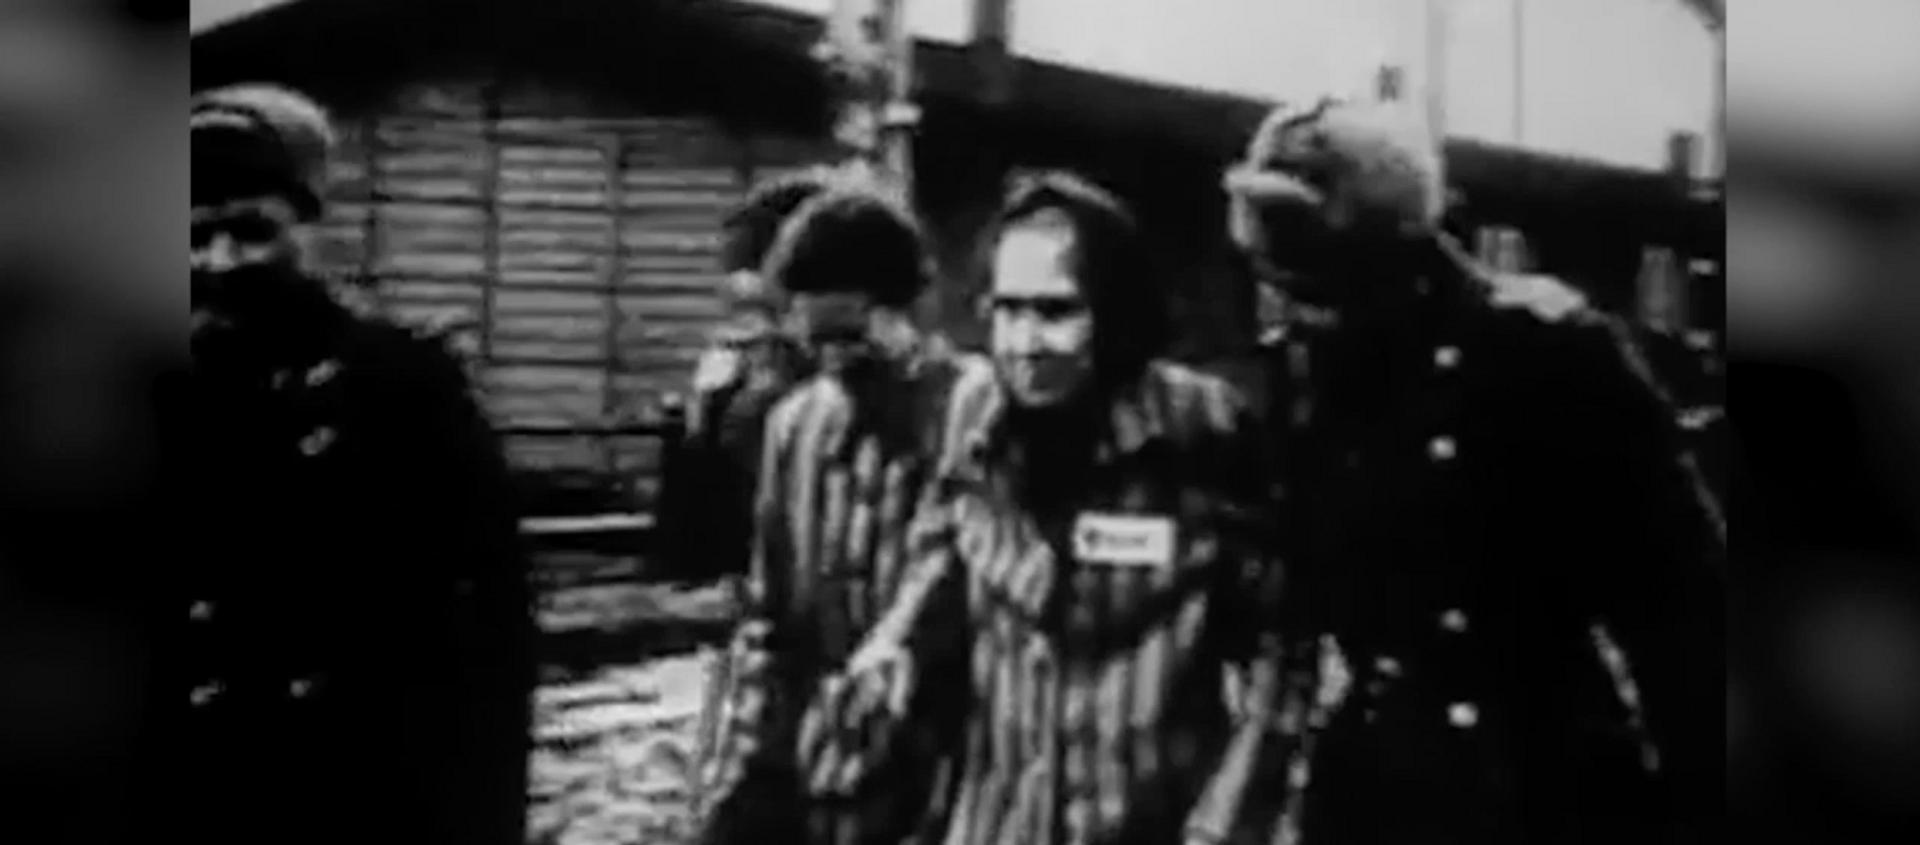 Holokaust - Sputnik Polska, 1920, 27.01.2021